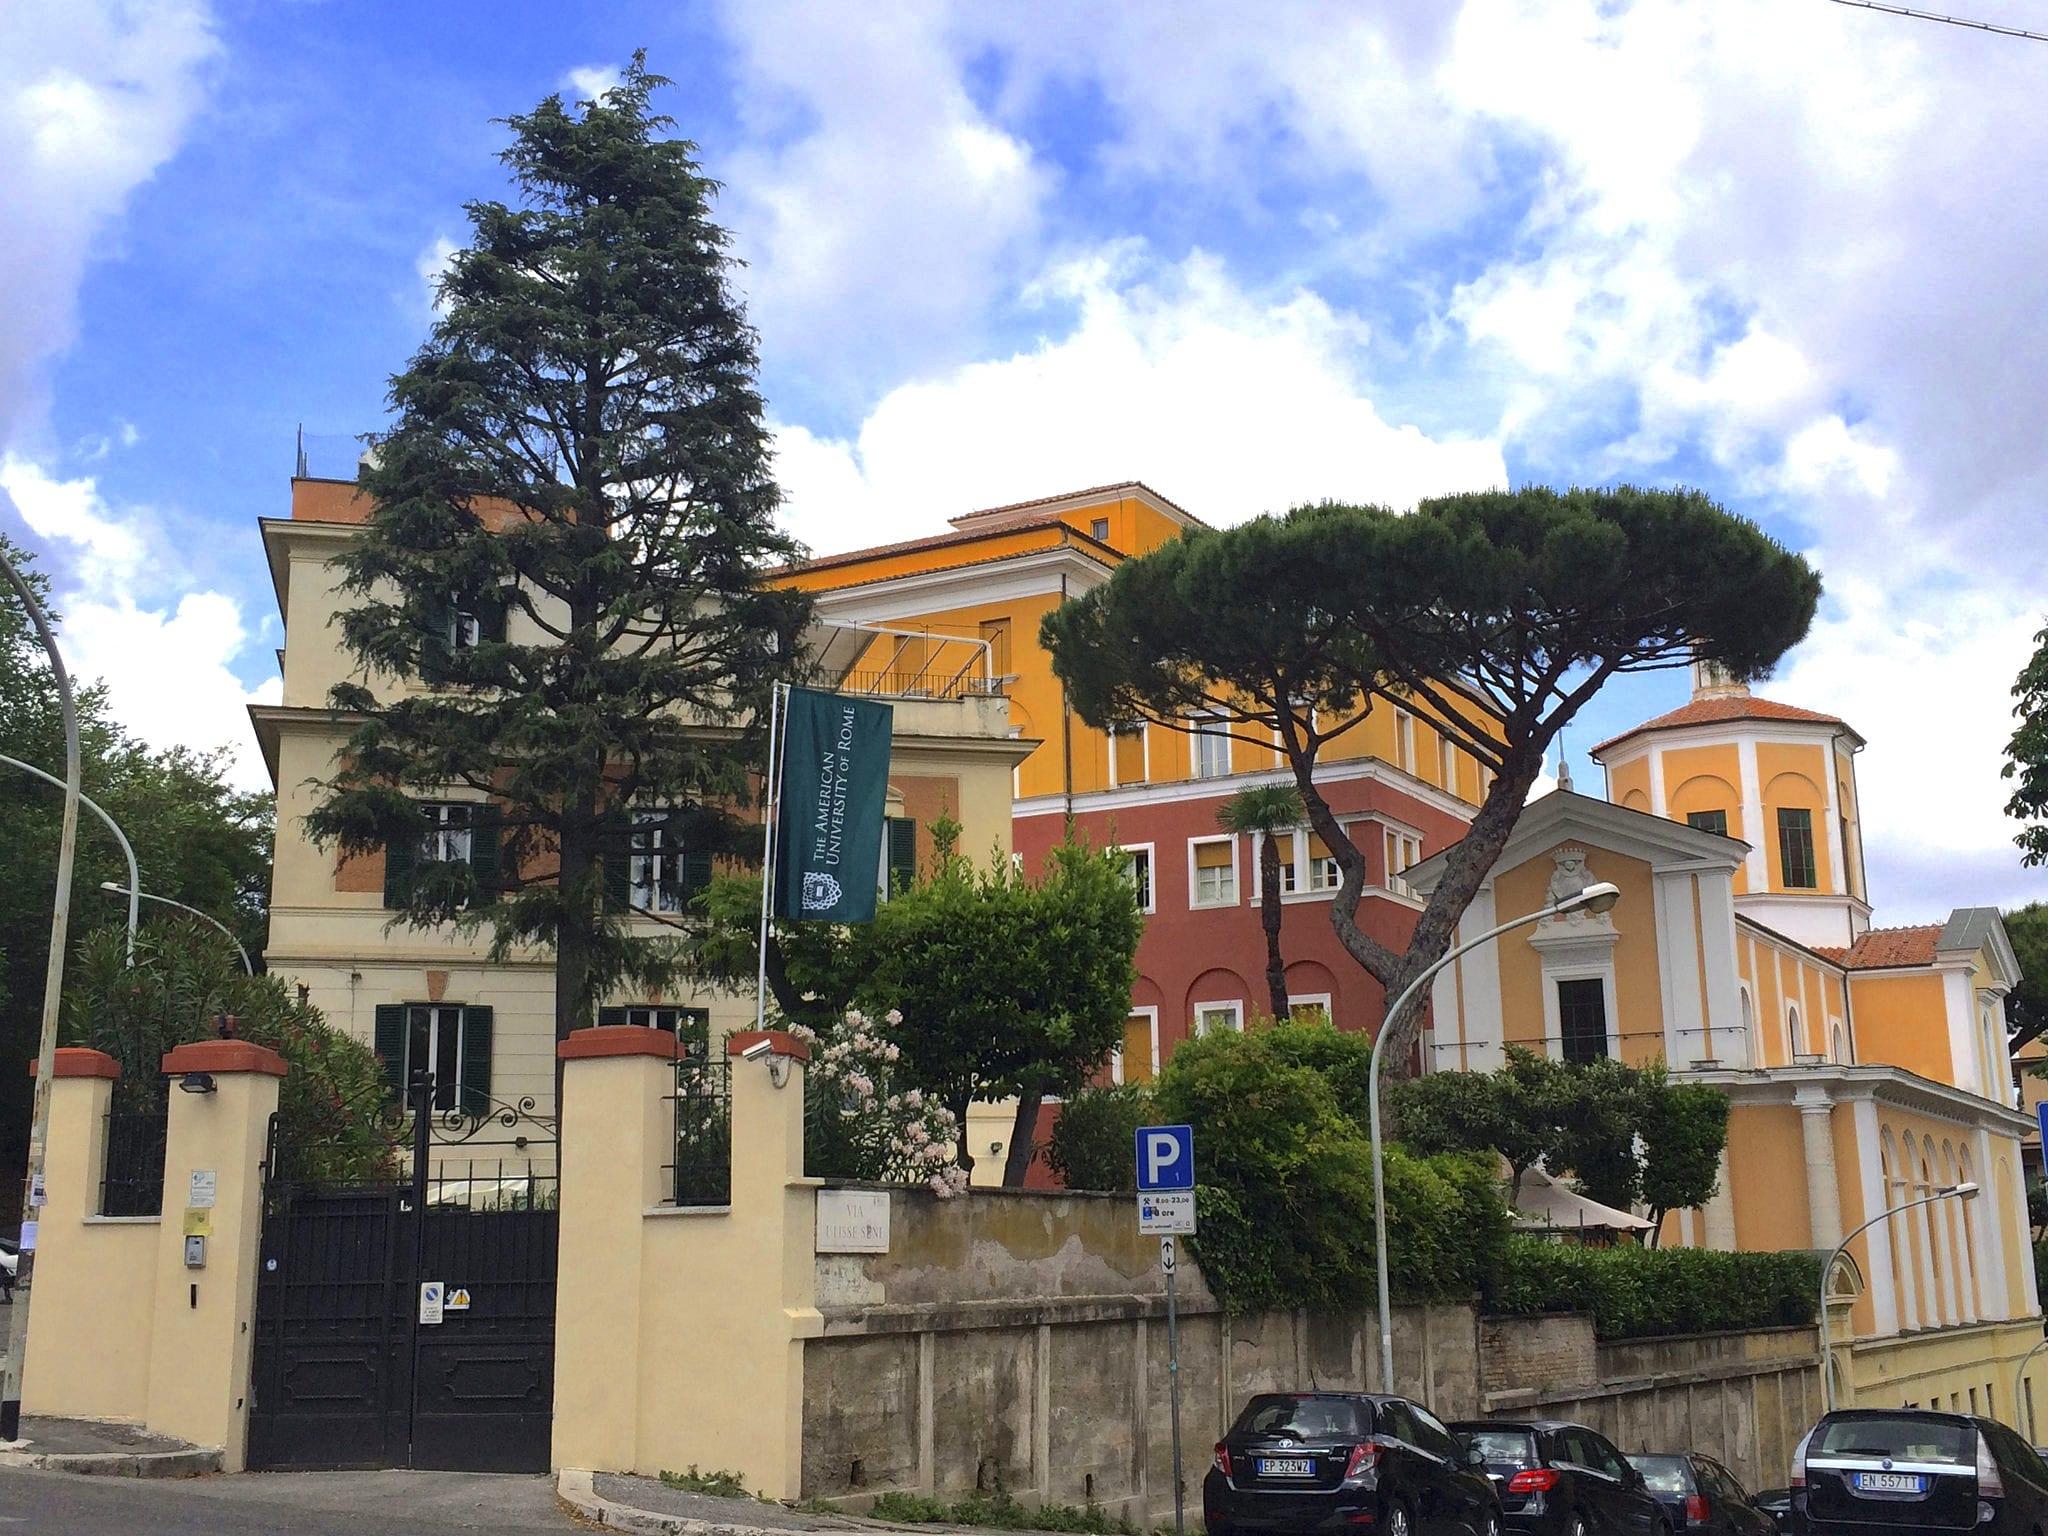 Italy-American-University-of-Rome